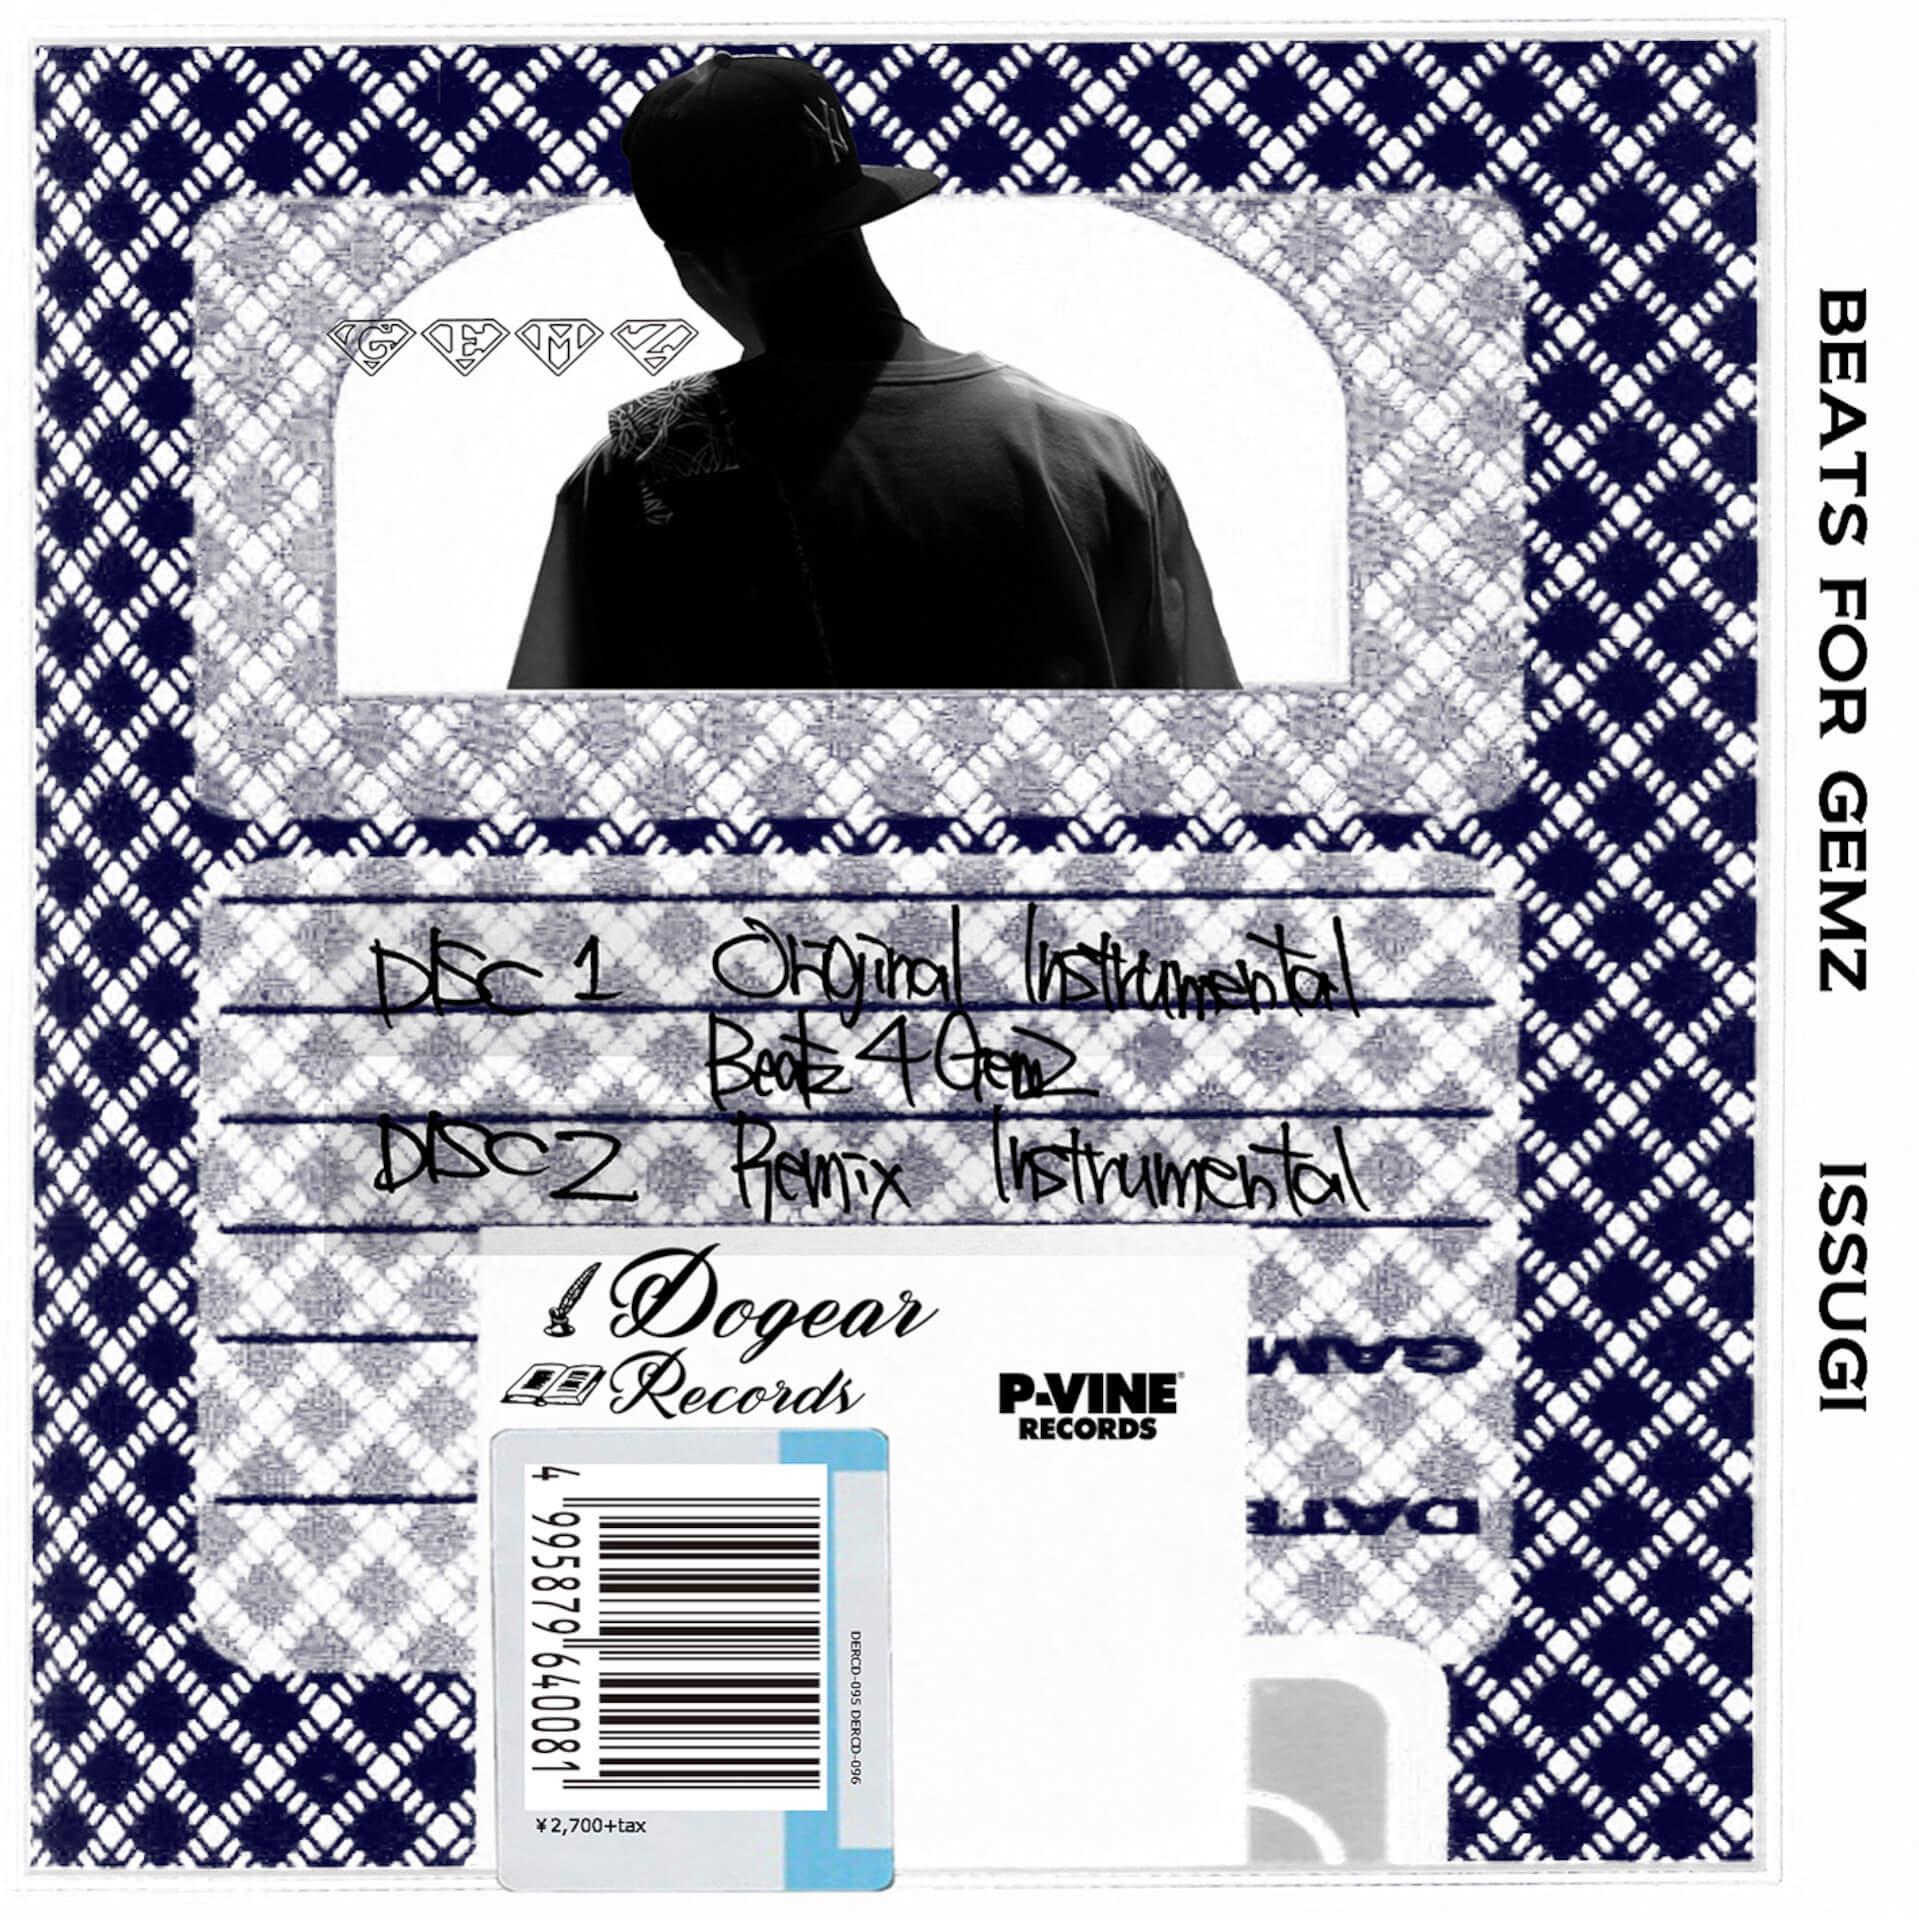 ISSUGI『GEMZ』&『16GEMZ』のインストアルバム『BEATS FOR GEMZ』が本日配信リリース! music210611_issugi_gemz_2